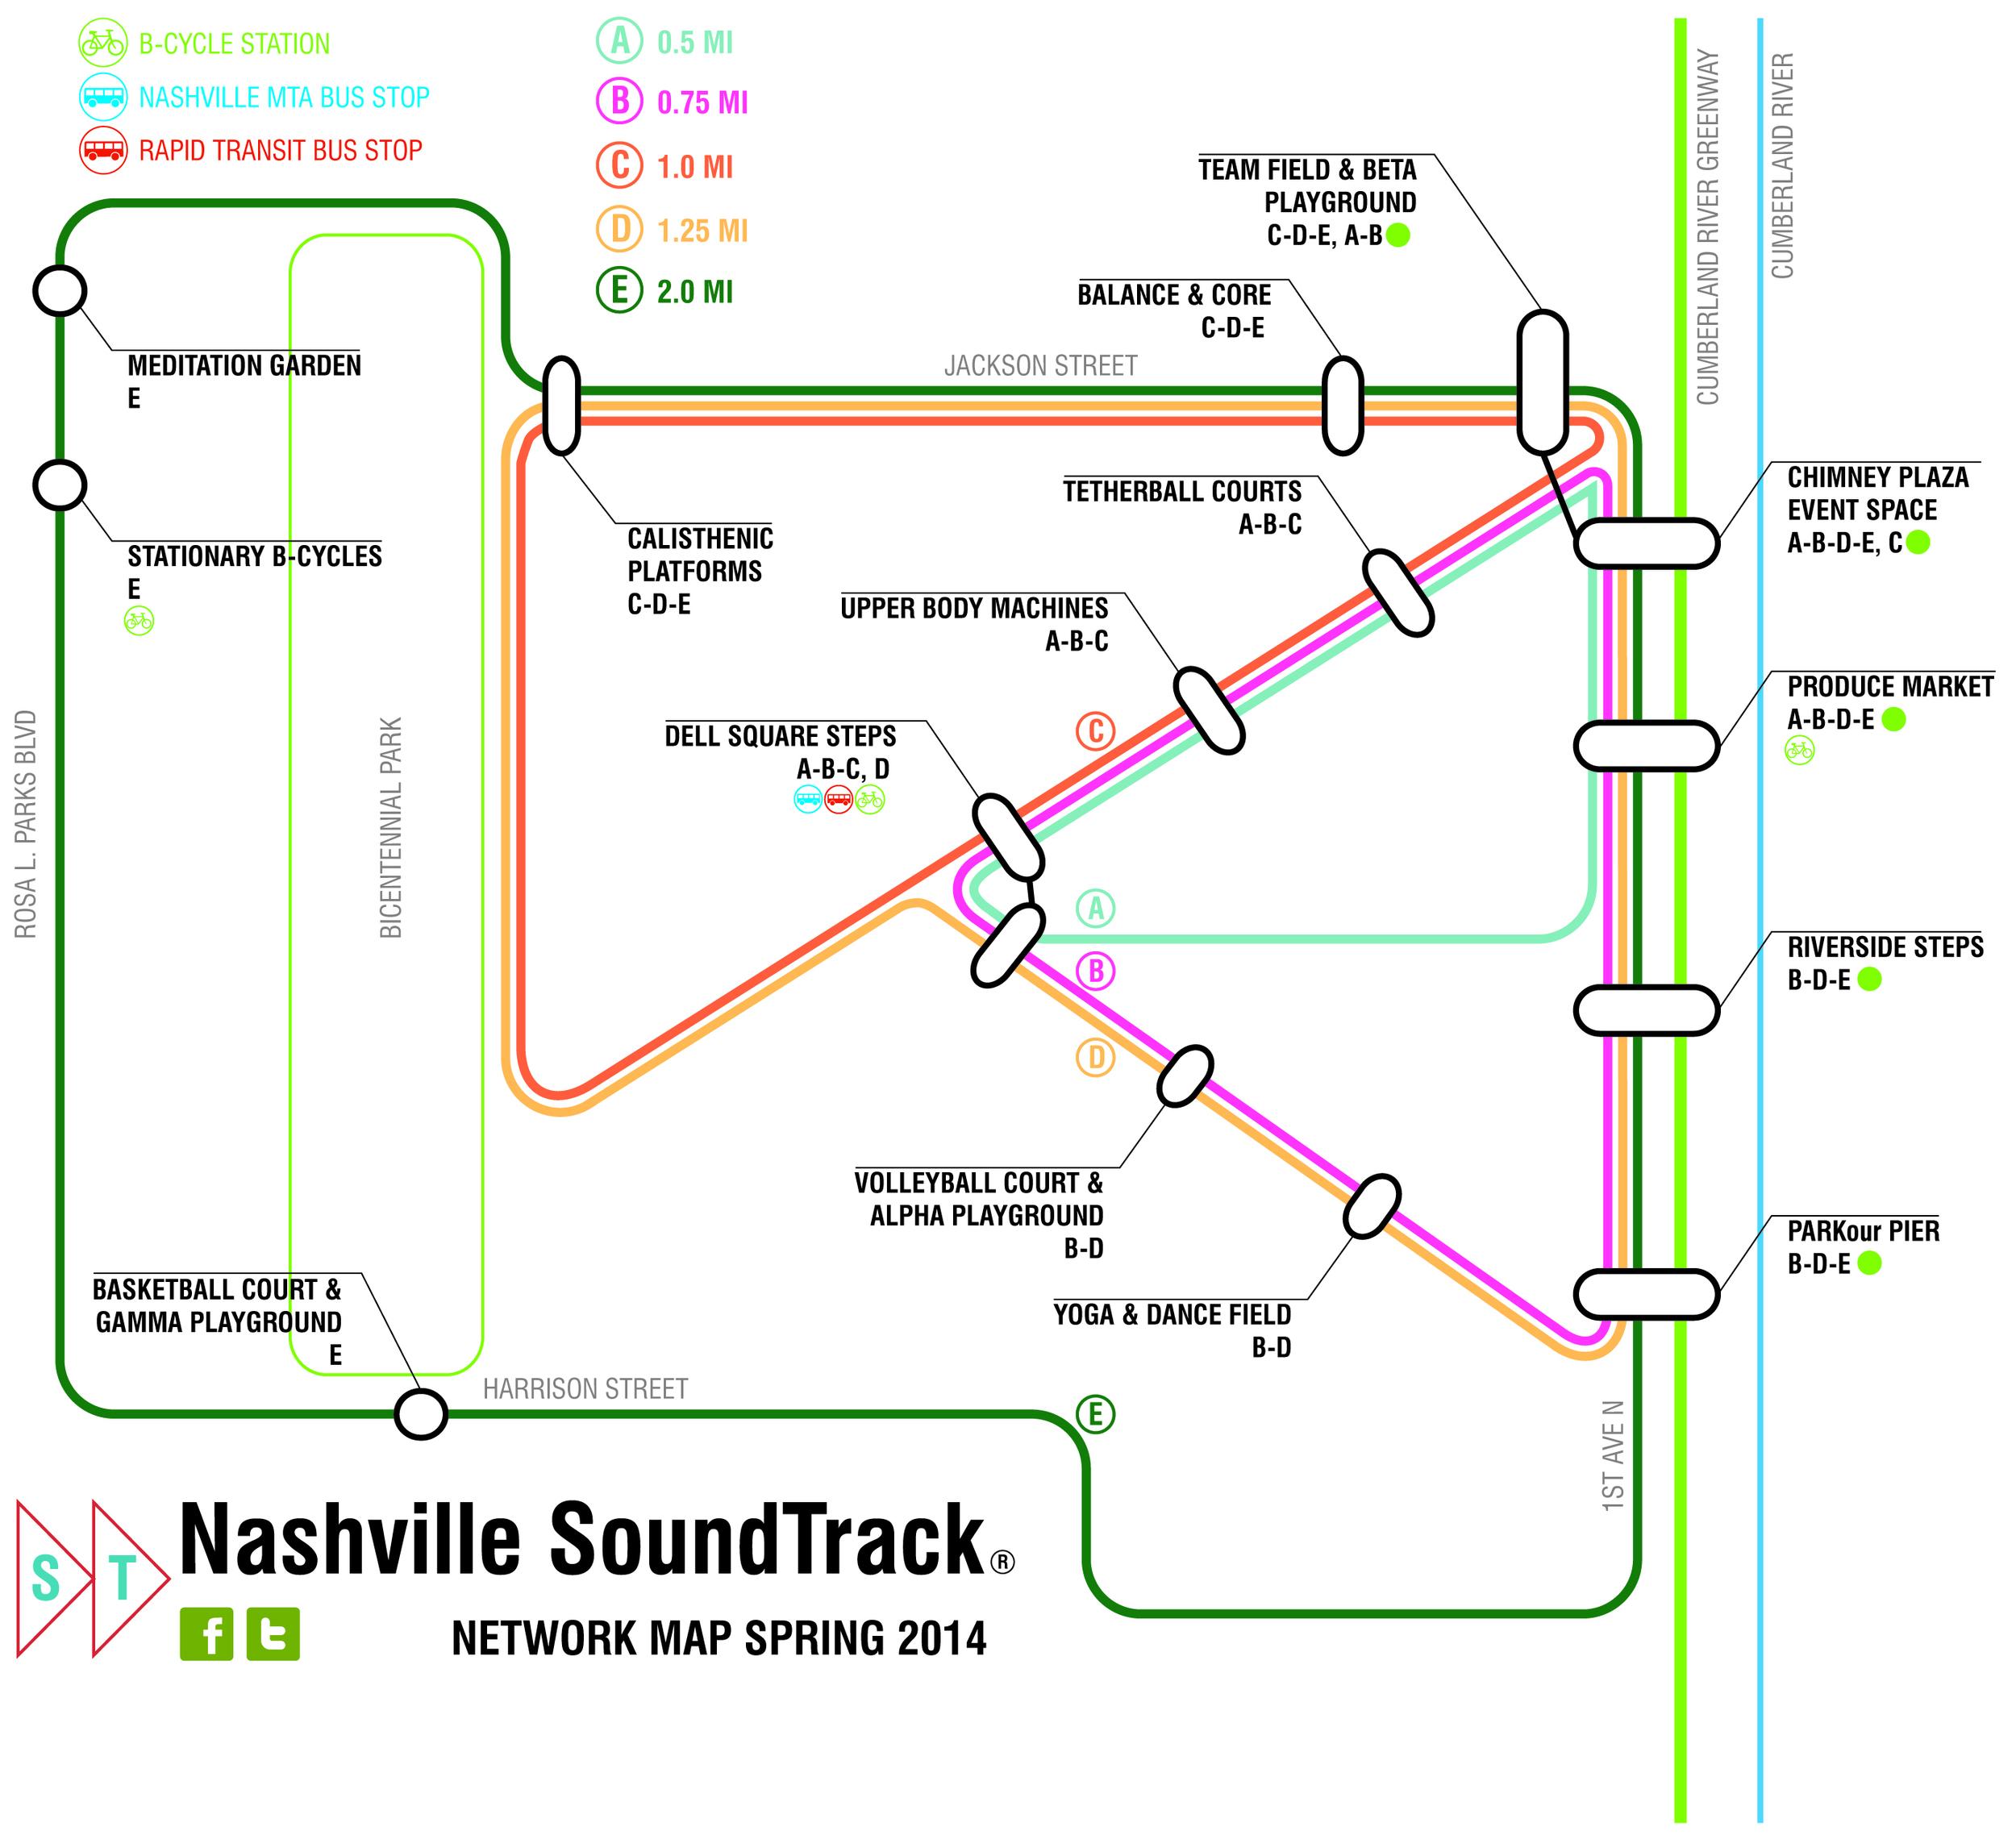 Fitness Network subway map.jpg